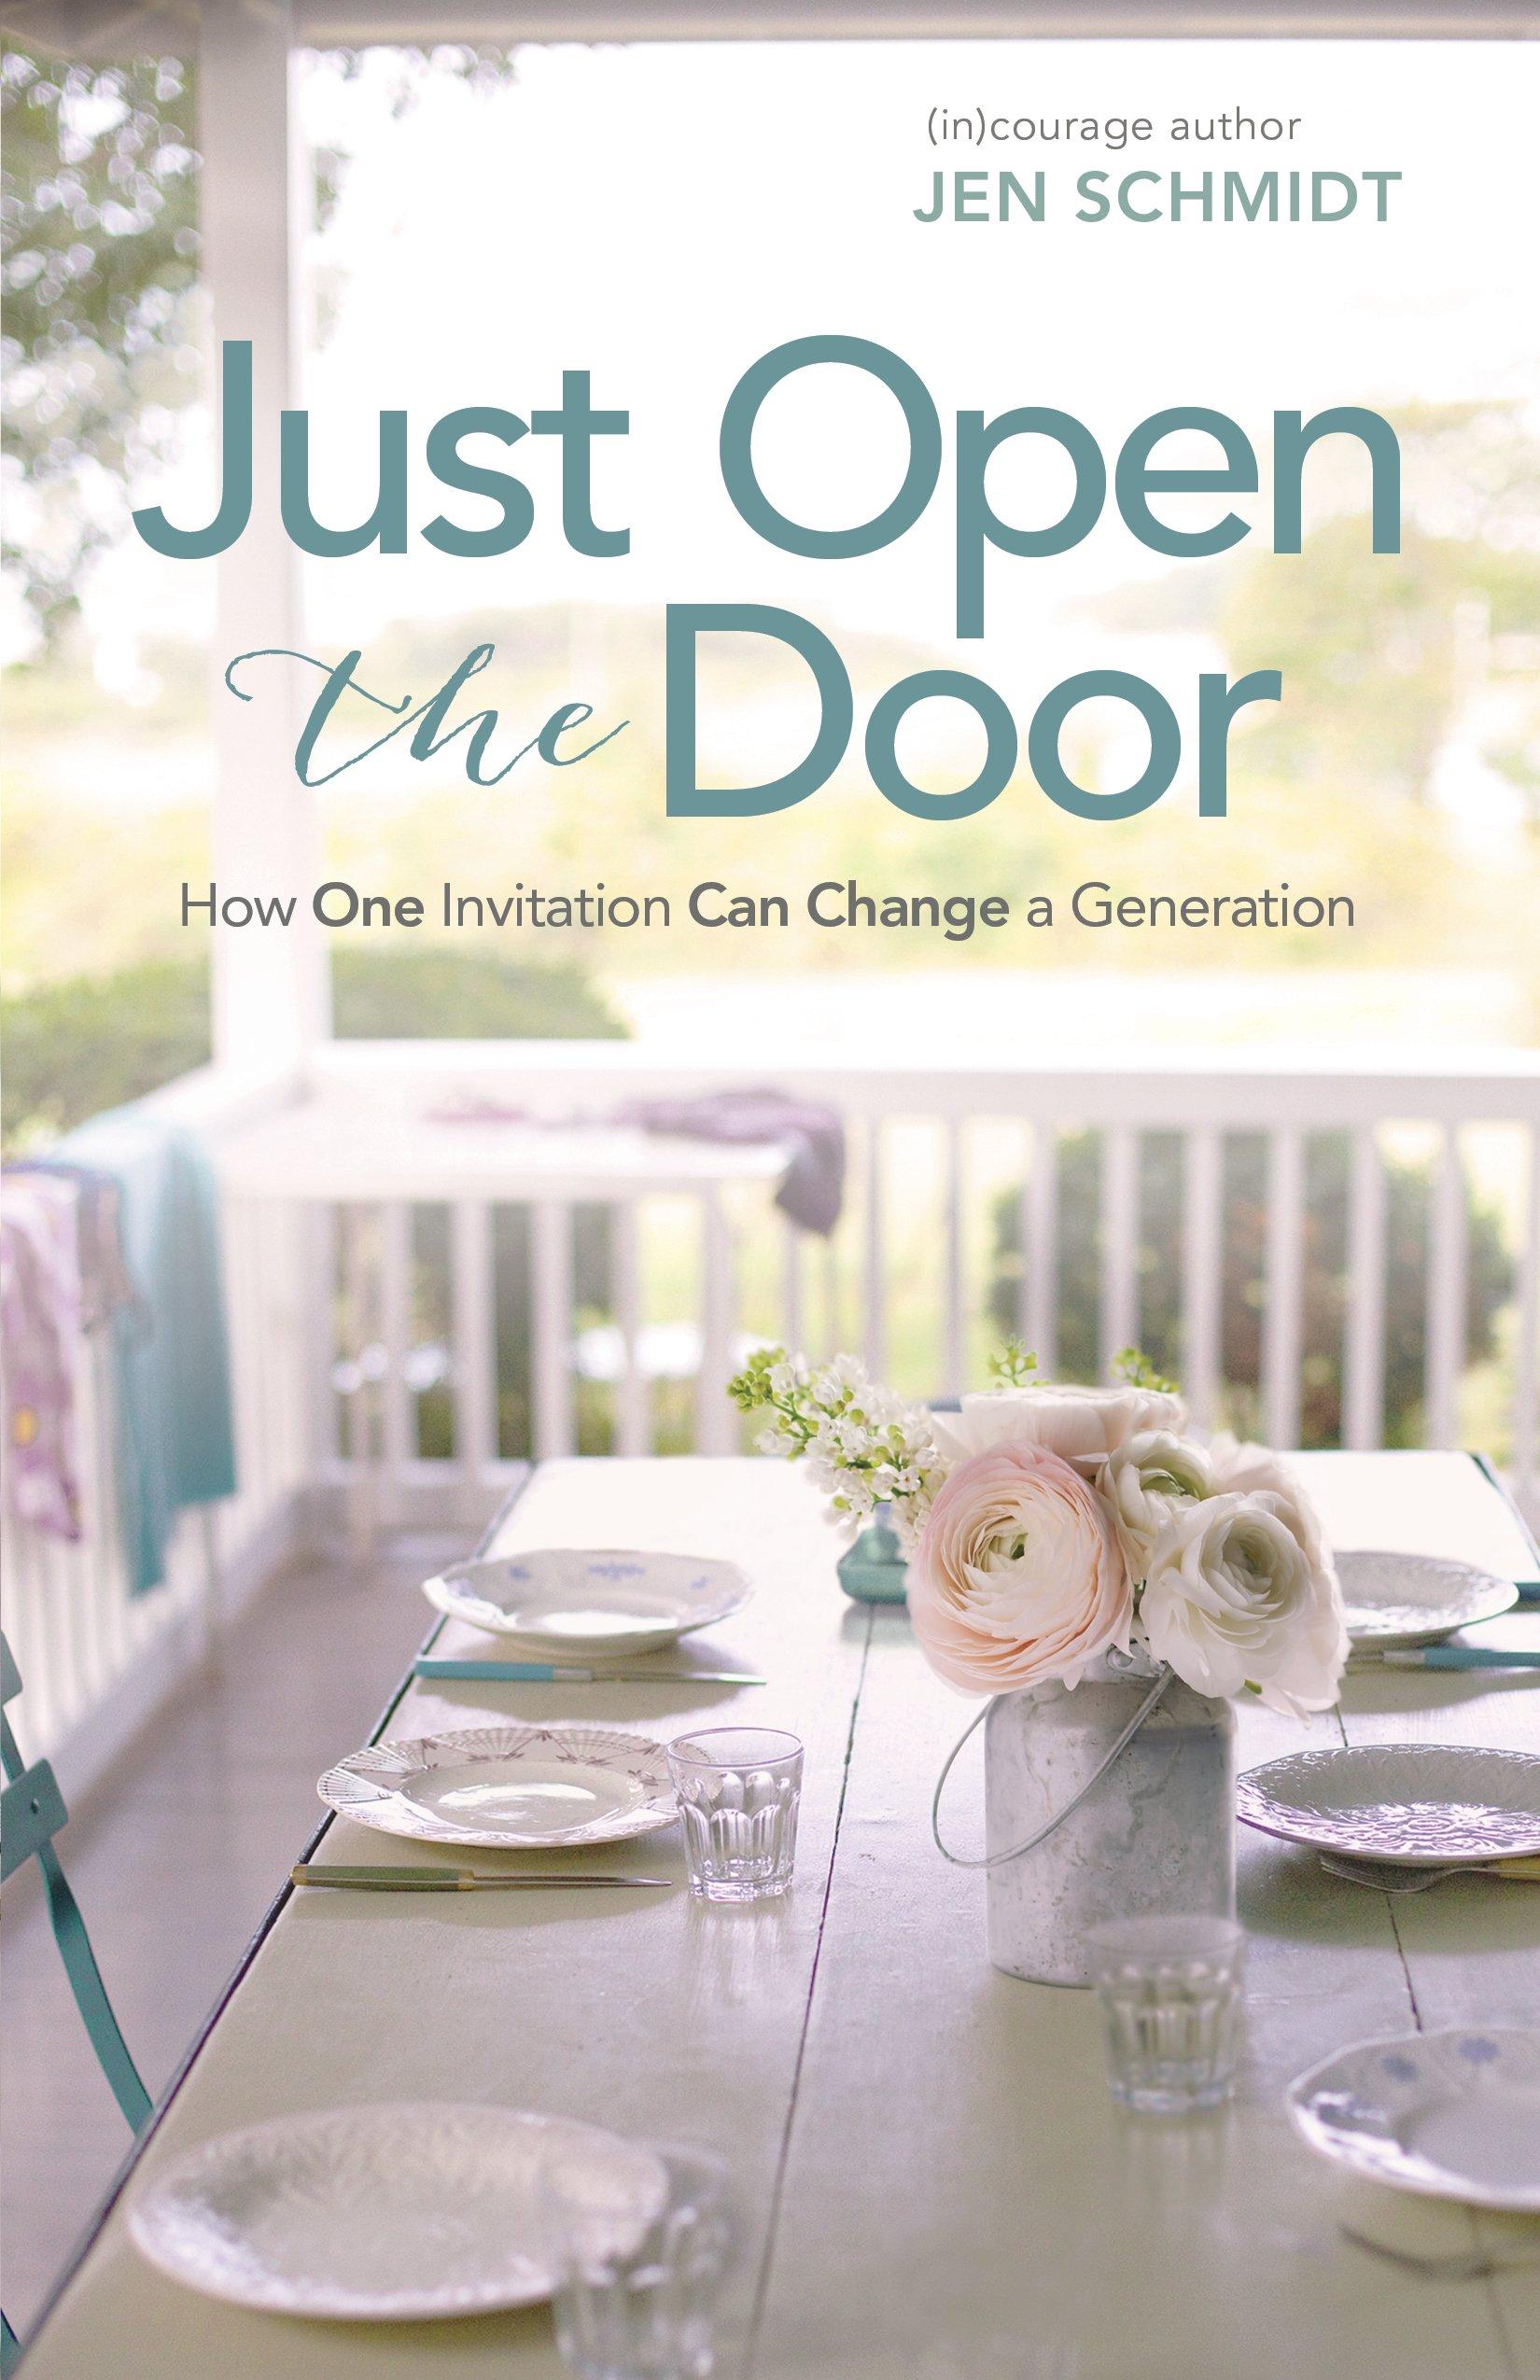 Just Open the Door How One Invitation Can Change a Generation Jen Schmidt (in)courage 9781433643071 Amazon.com Books  sc 1 st  Amazon.com & Just Open the Door: How One Invitation Can Change a Generation: Jen ...